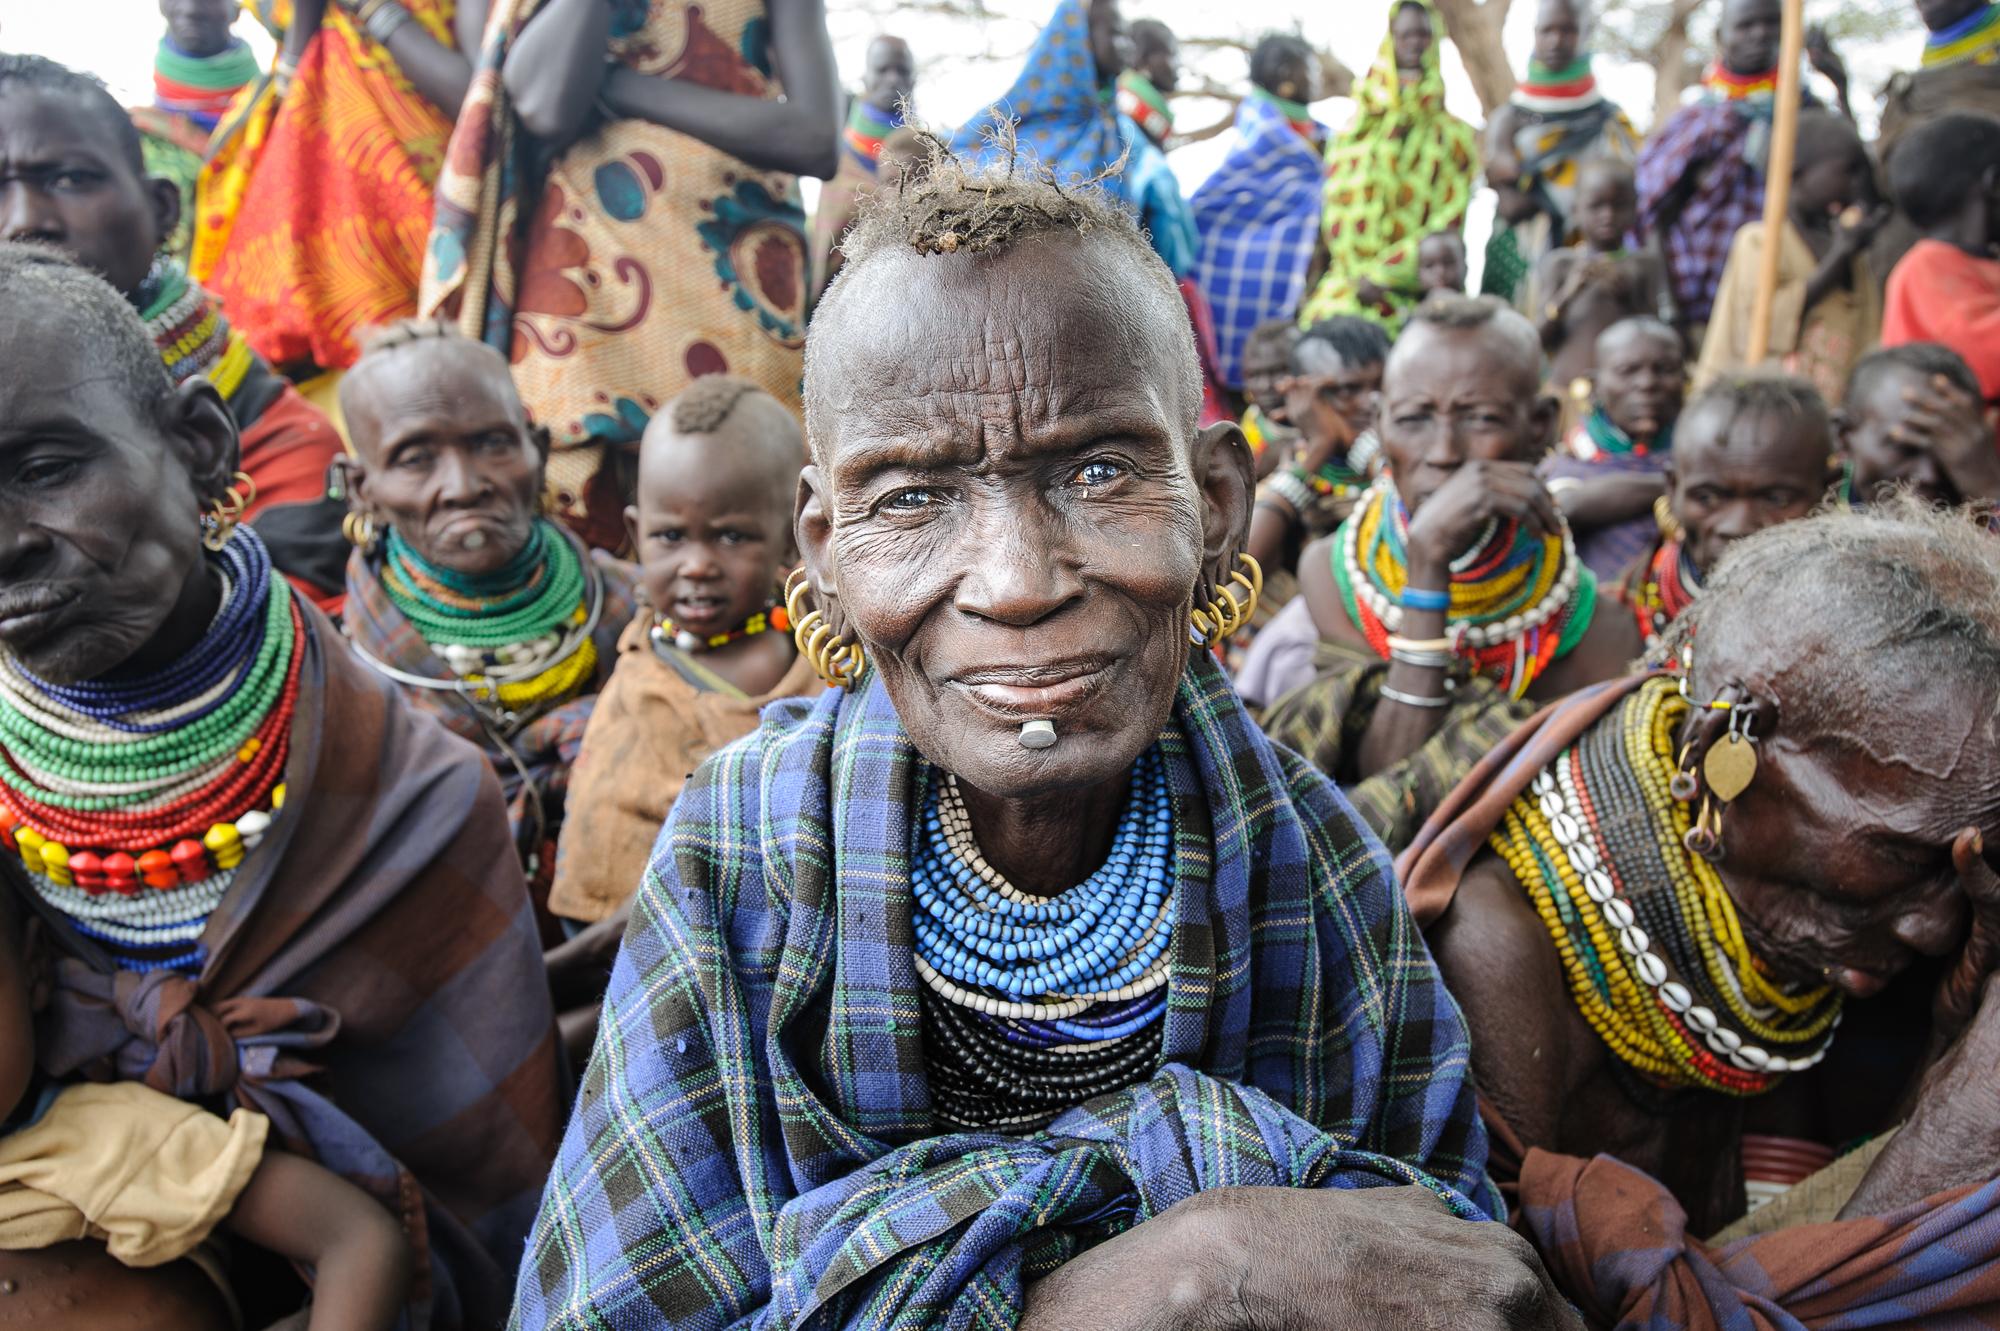 AE_Turkana_0911_0628-4.jpg